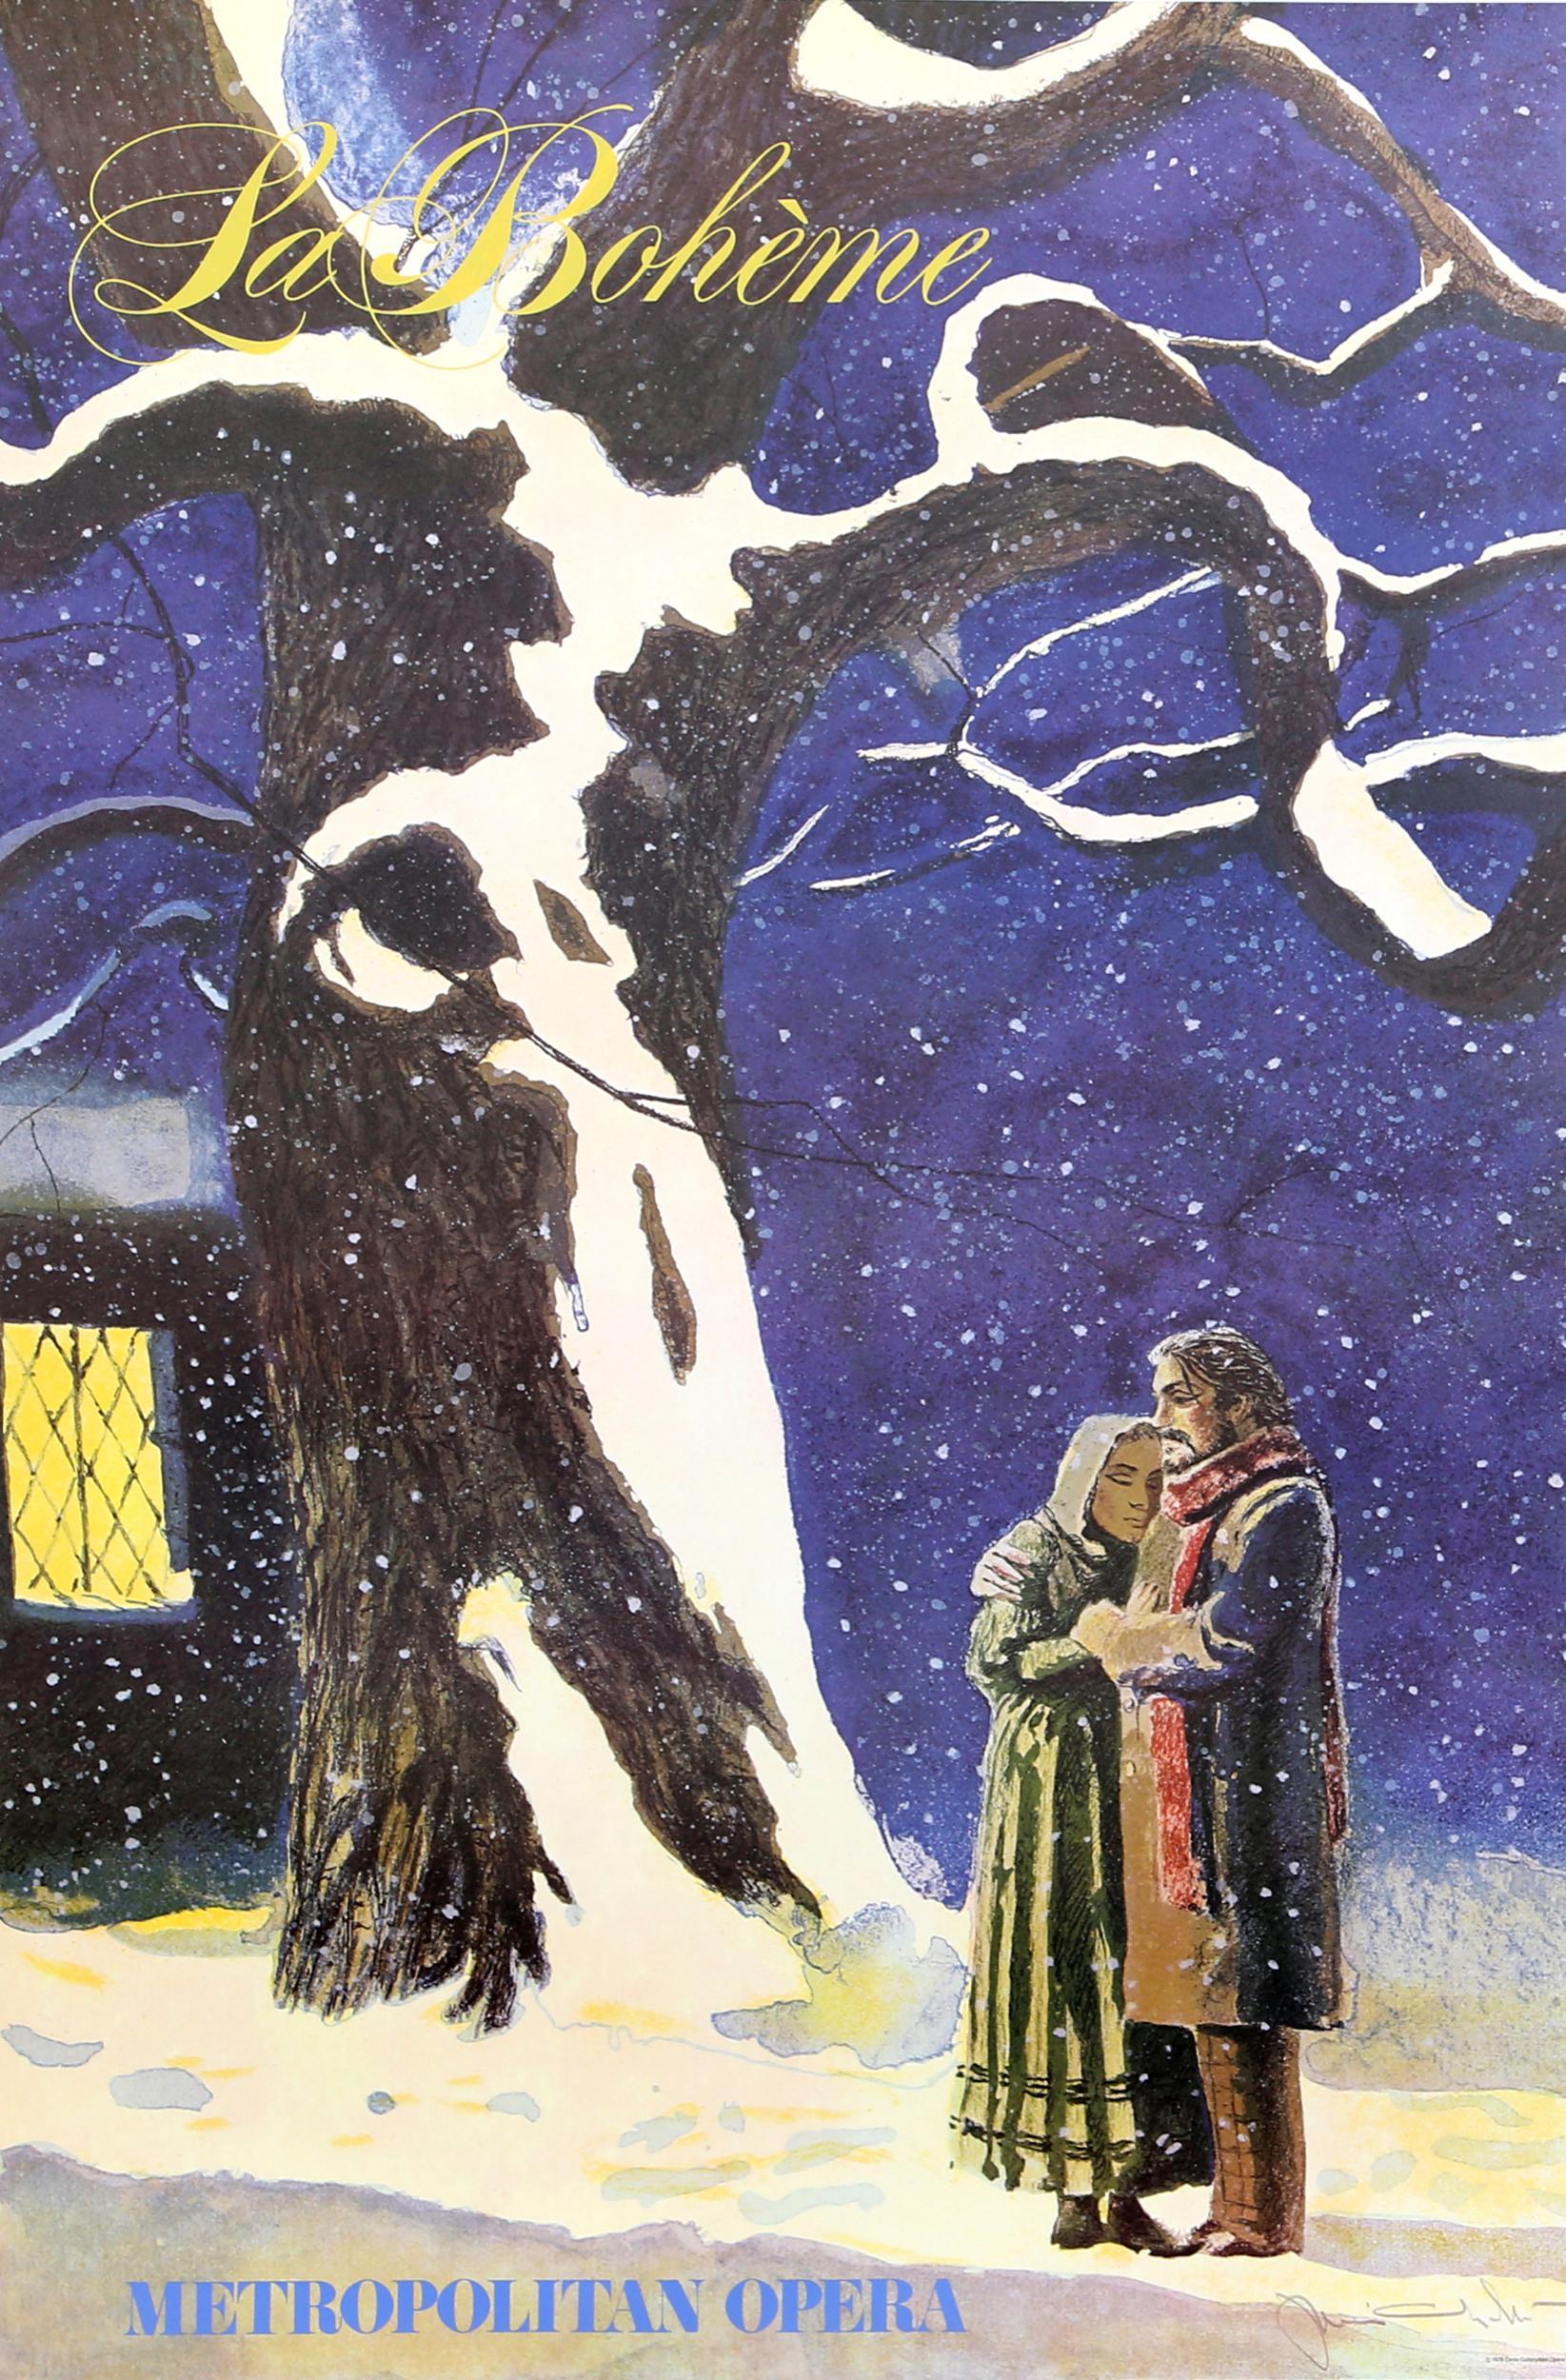 Jamie Wyeth, La Boheme (Metropolitan Opera), Poster on Heavy Stock